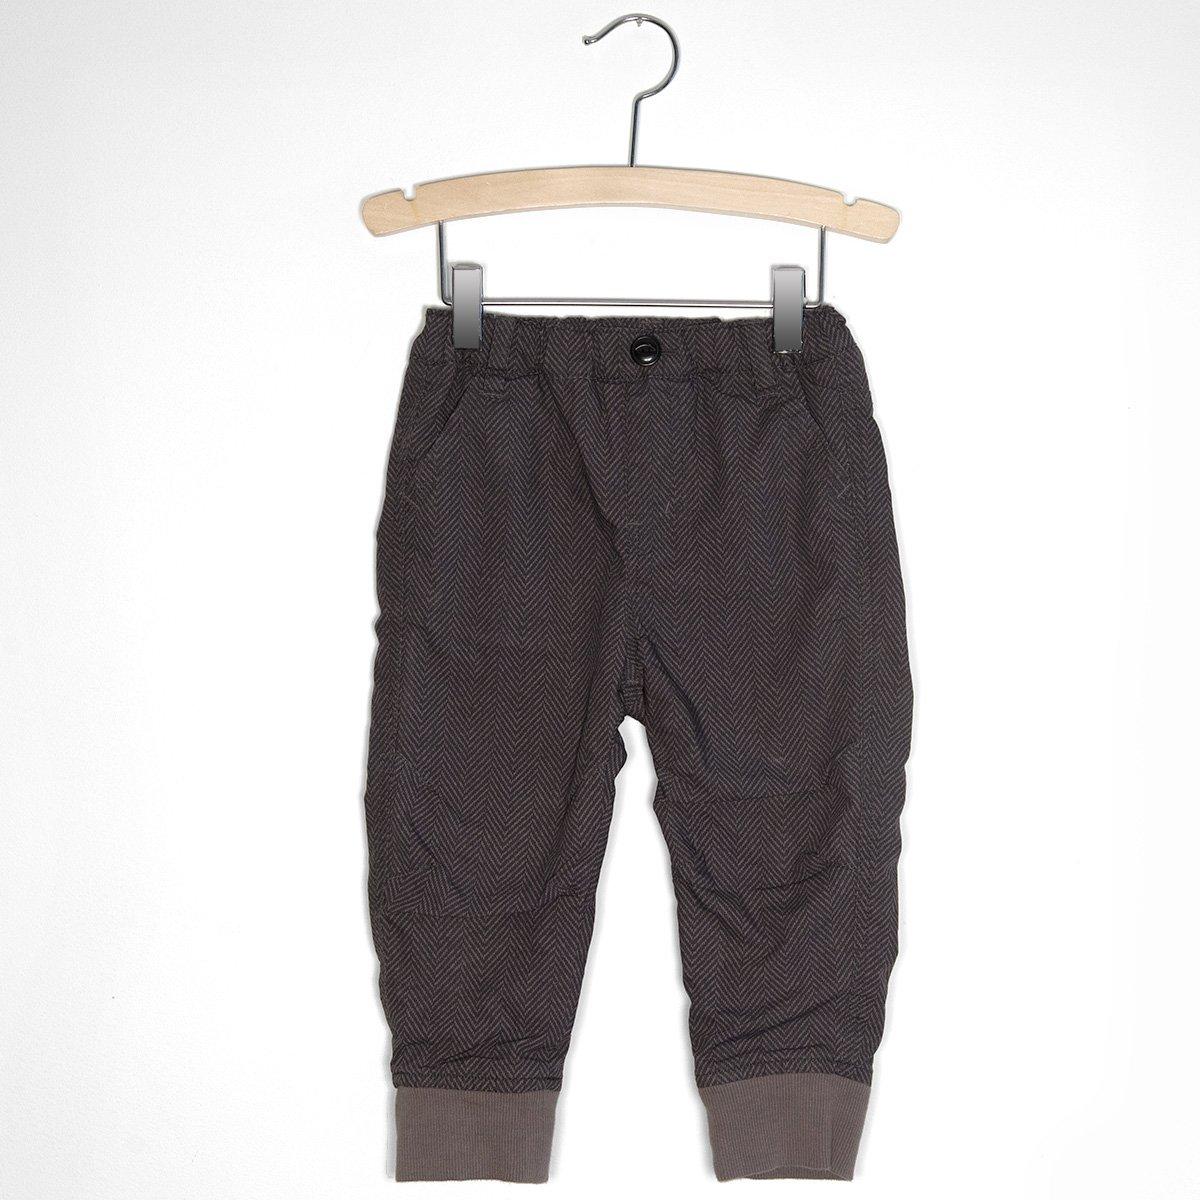 Bitz Kids Lined Fleece Pants, $24 (on sale) @bitzkidsnyc.com